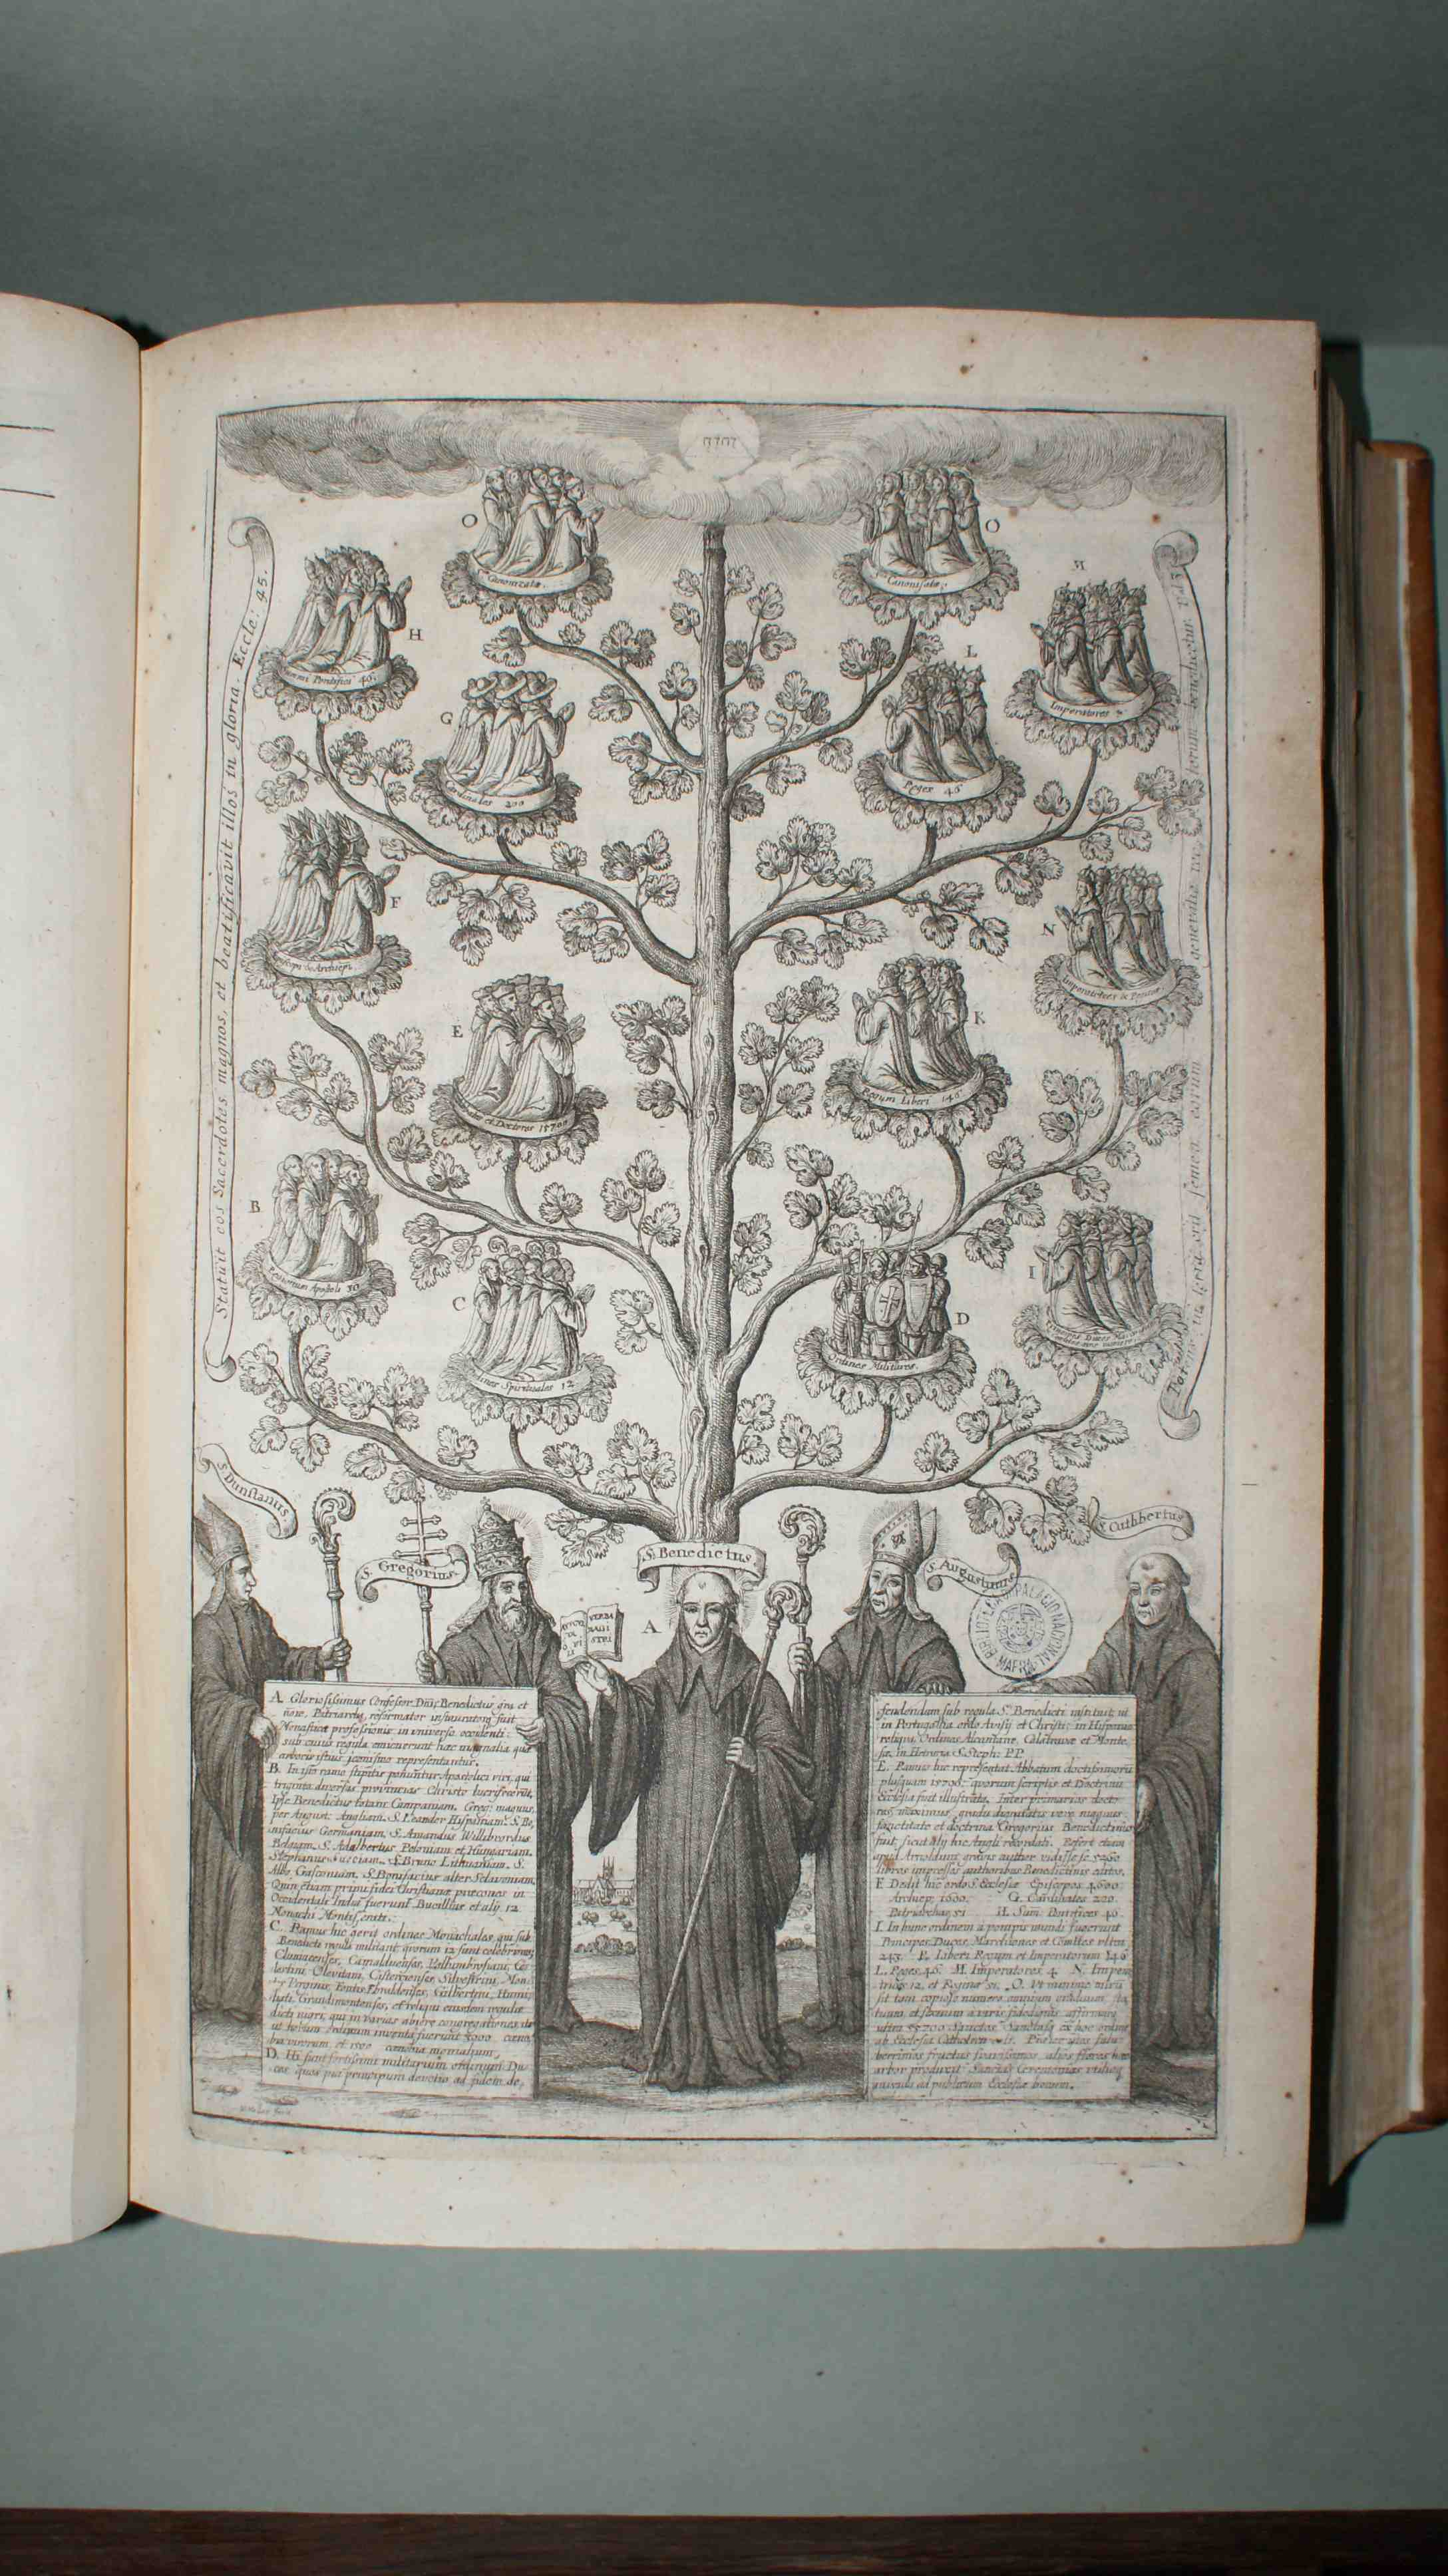 Monasticon anglicanum... per Rogerum Dodsworth, per  Gulielmum Dugdale, Dondini, 1655  (BPNM)